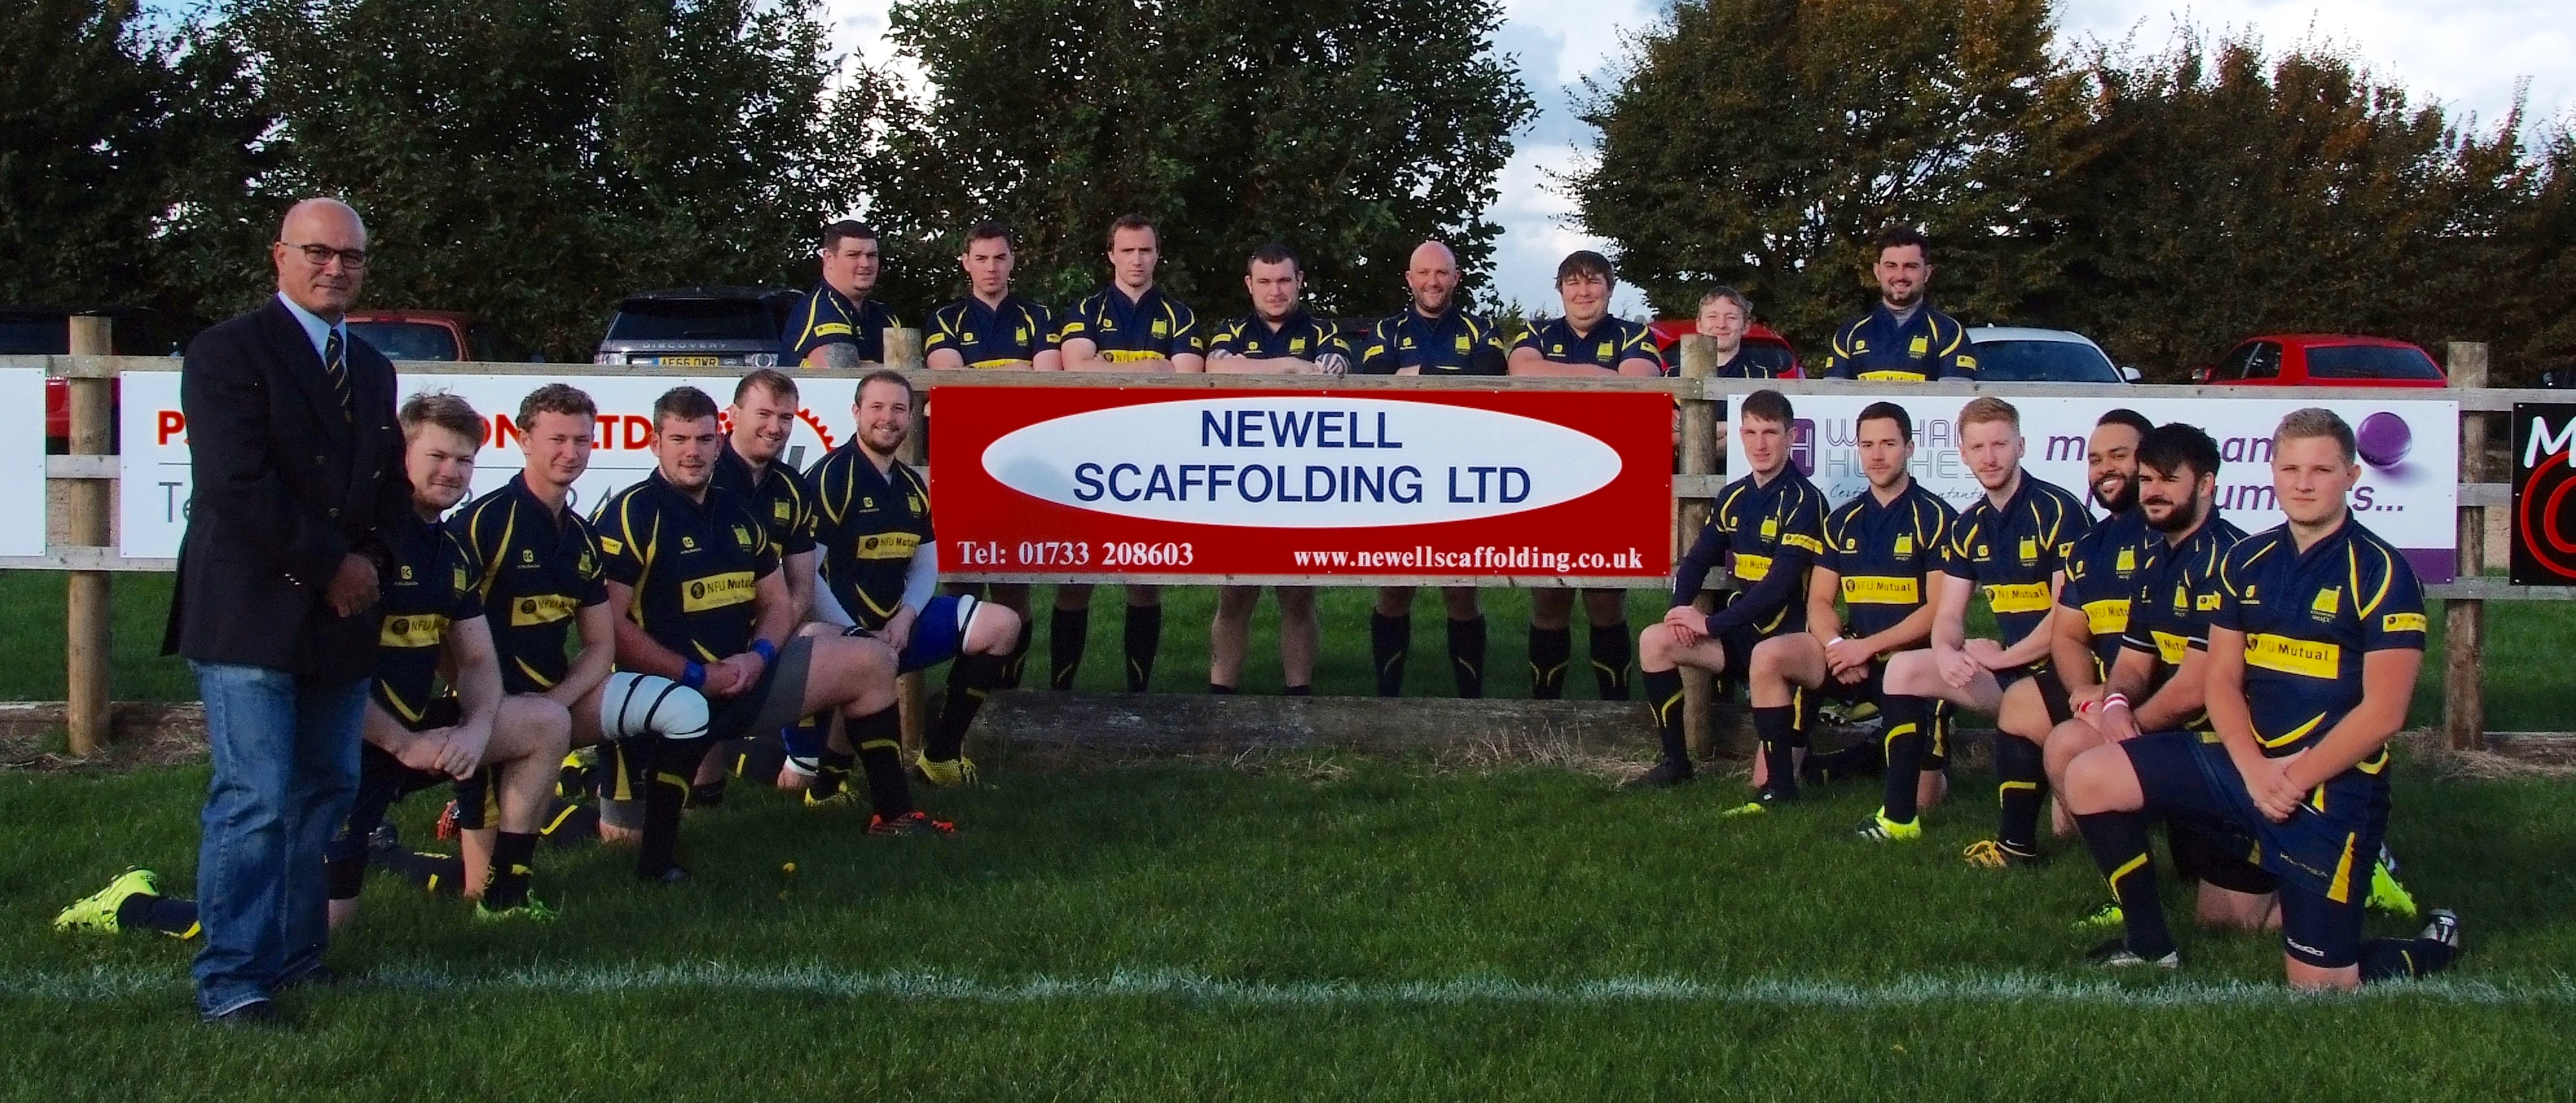 Newell Scaffolding